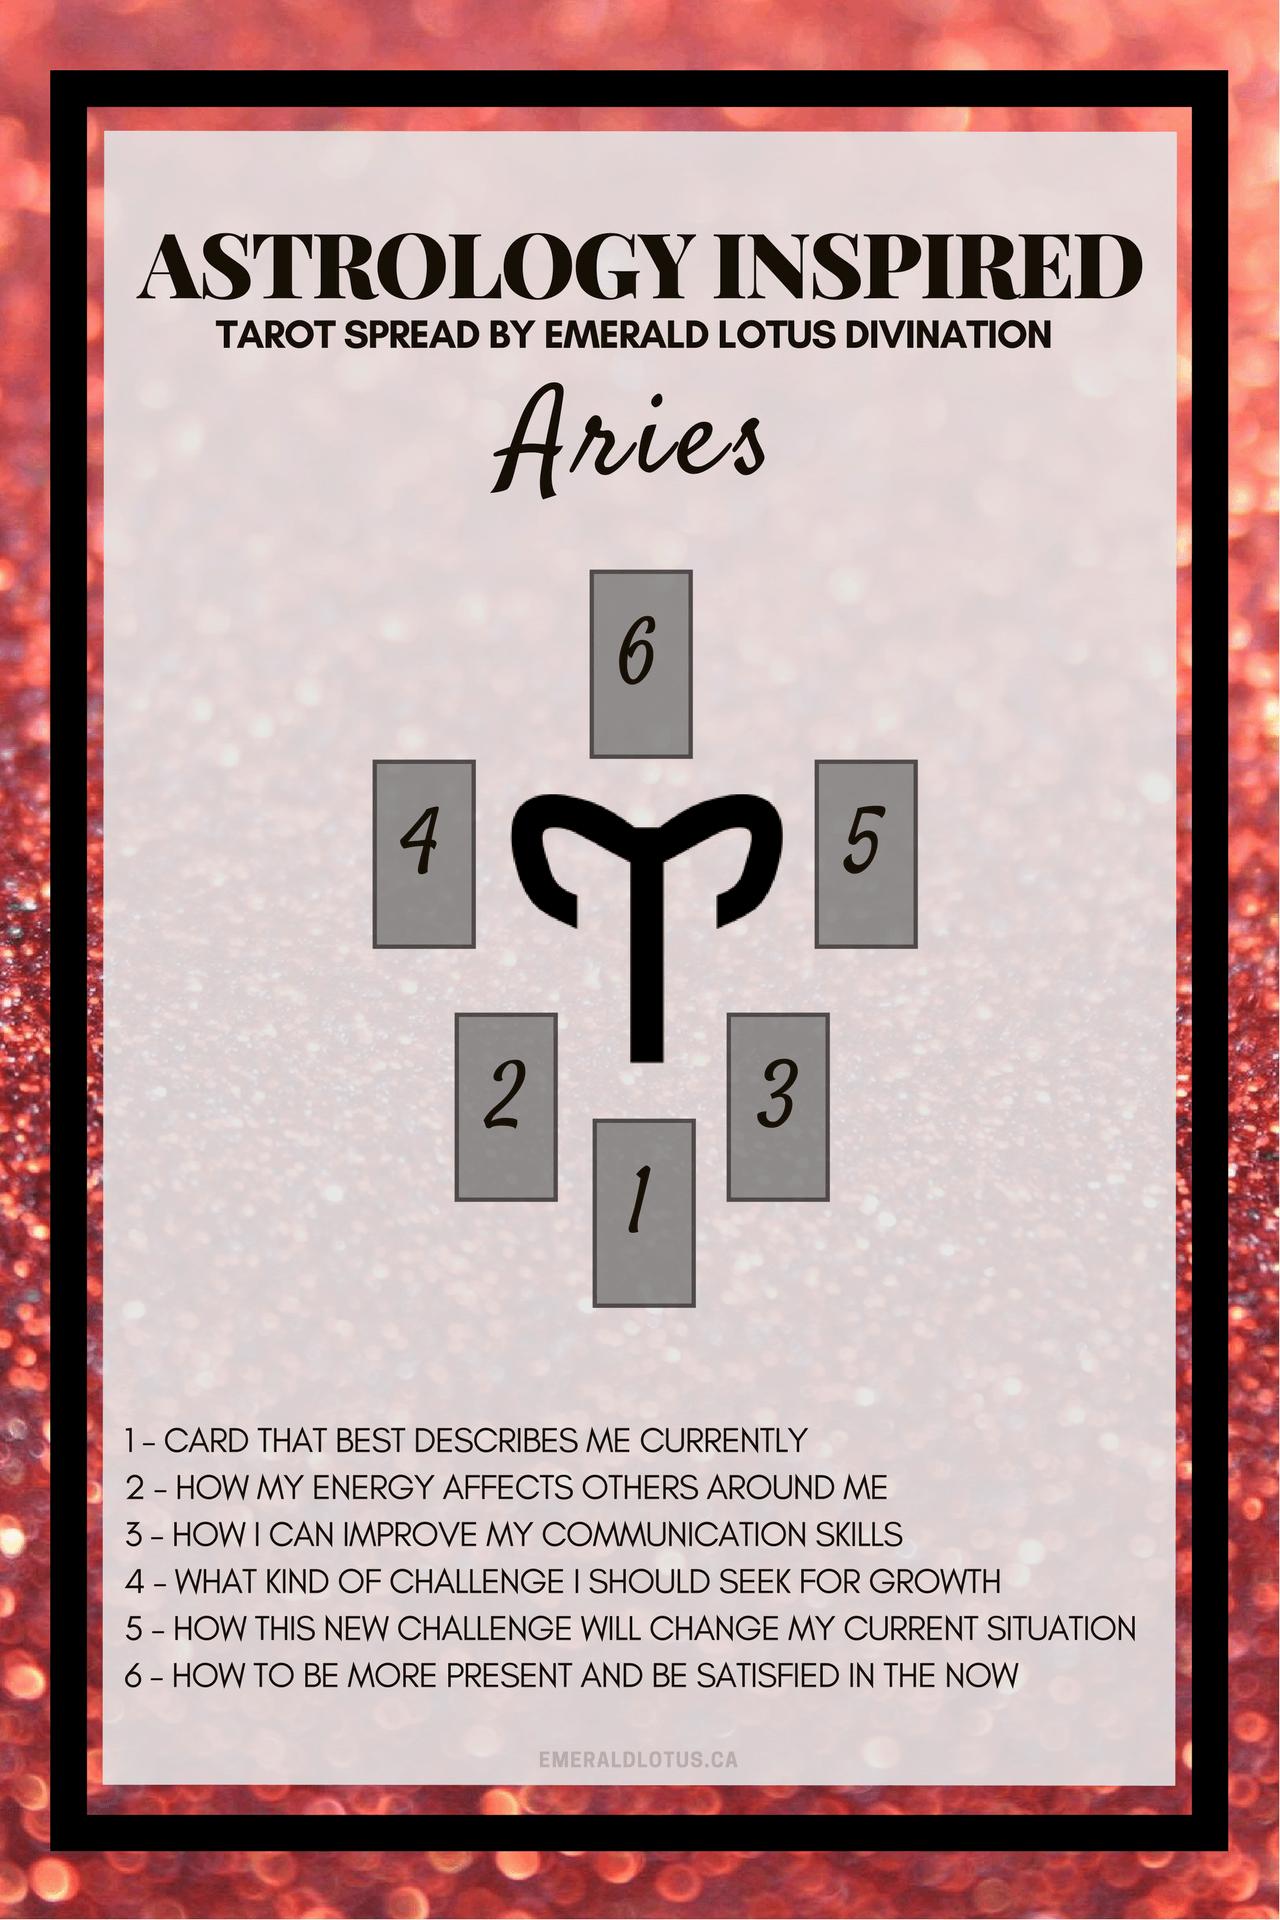 aries-tarot-spread-astrology-3-1.png